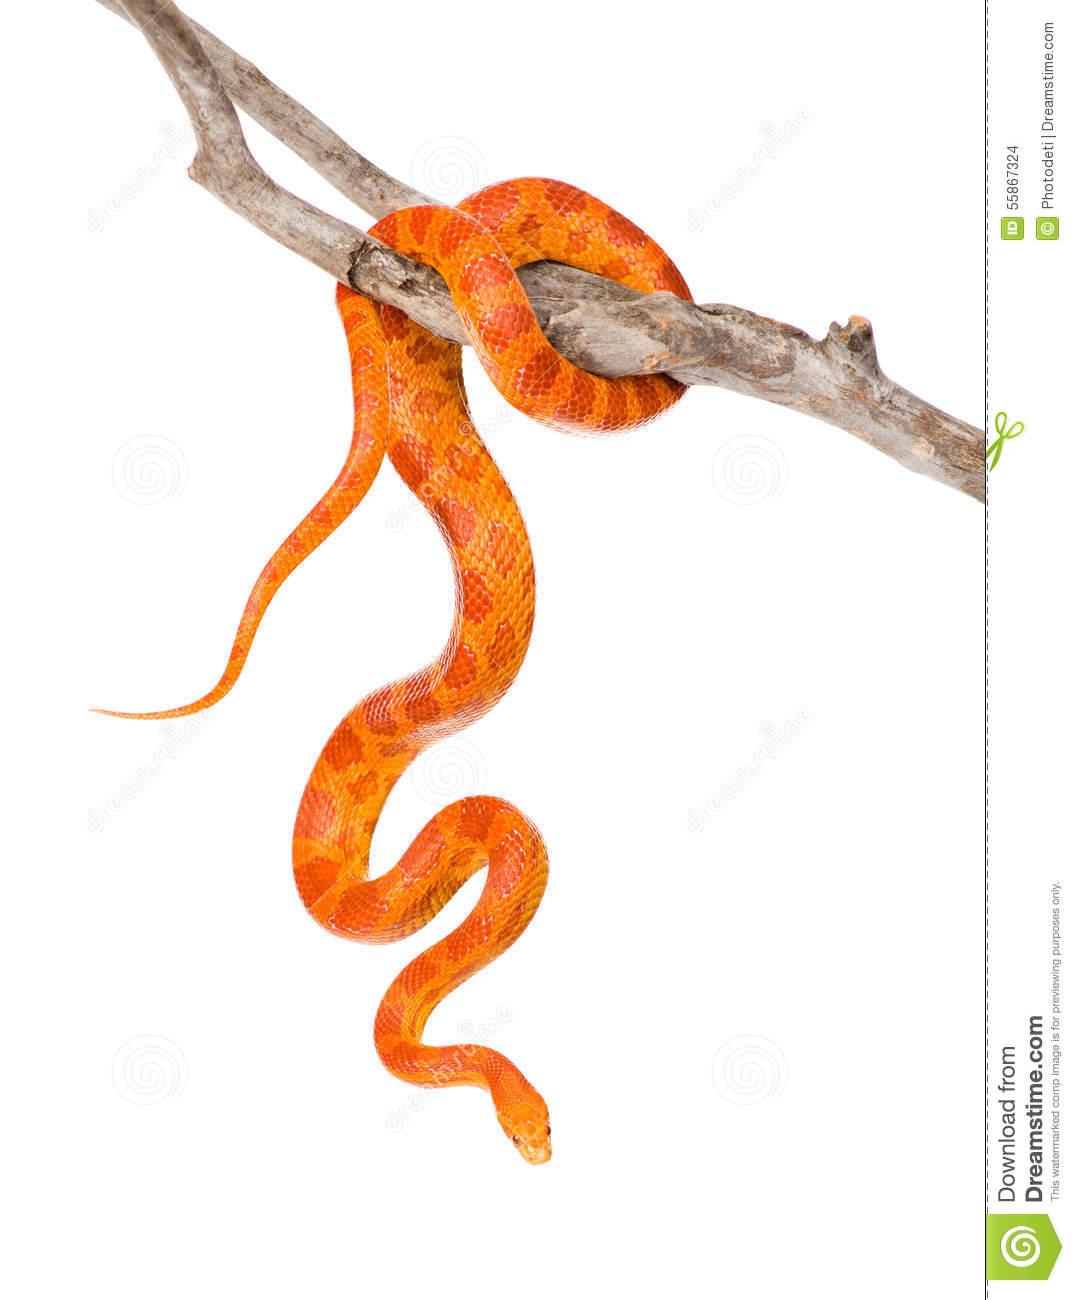 Creamsicle Corn Snake (Elaphe Guttata Guttata) On A Dry Branch.